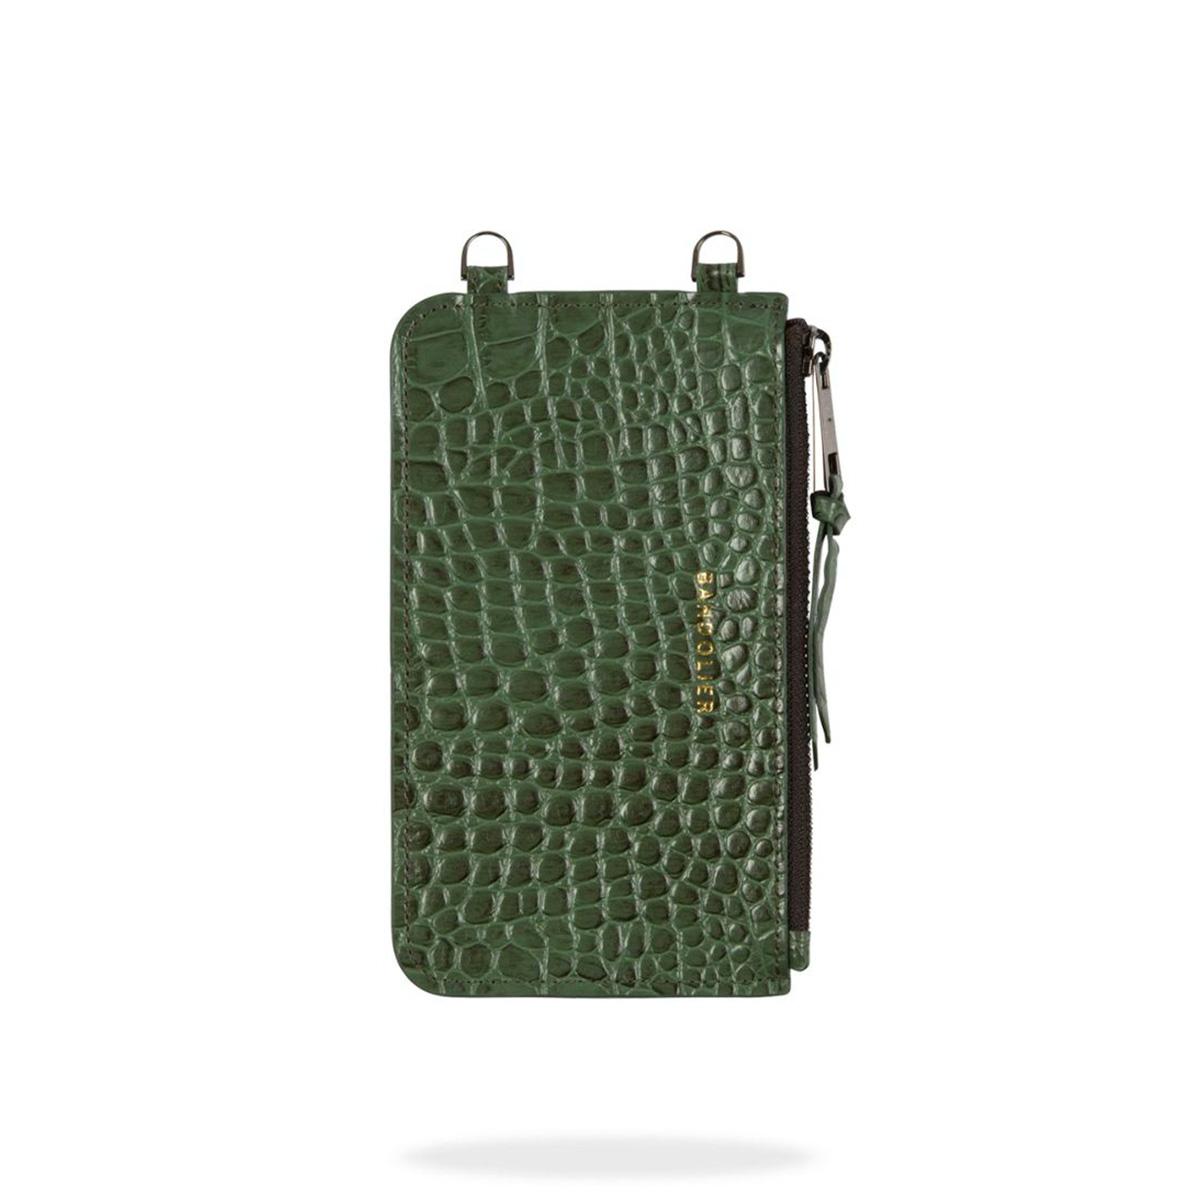 BANDOLIER EMMA CROC GREEN POUCH バンドリヤー ポーチ スマホ 携帯 レディース グリーン 20emm